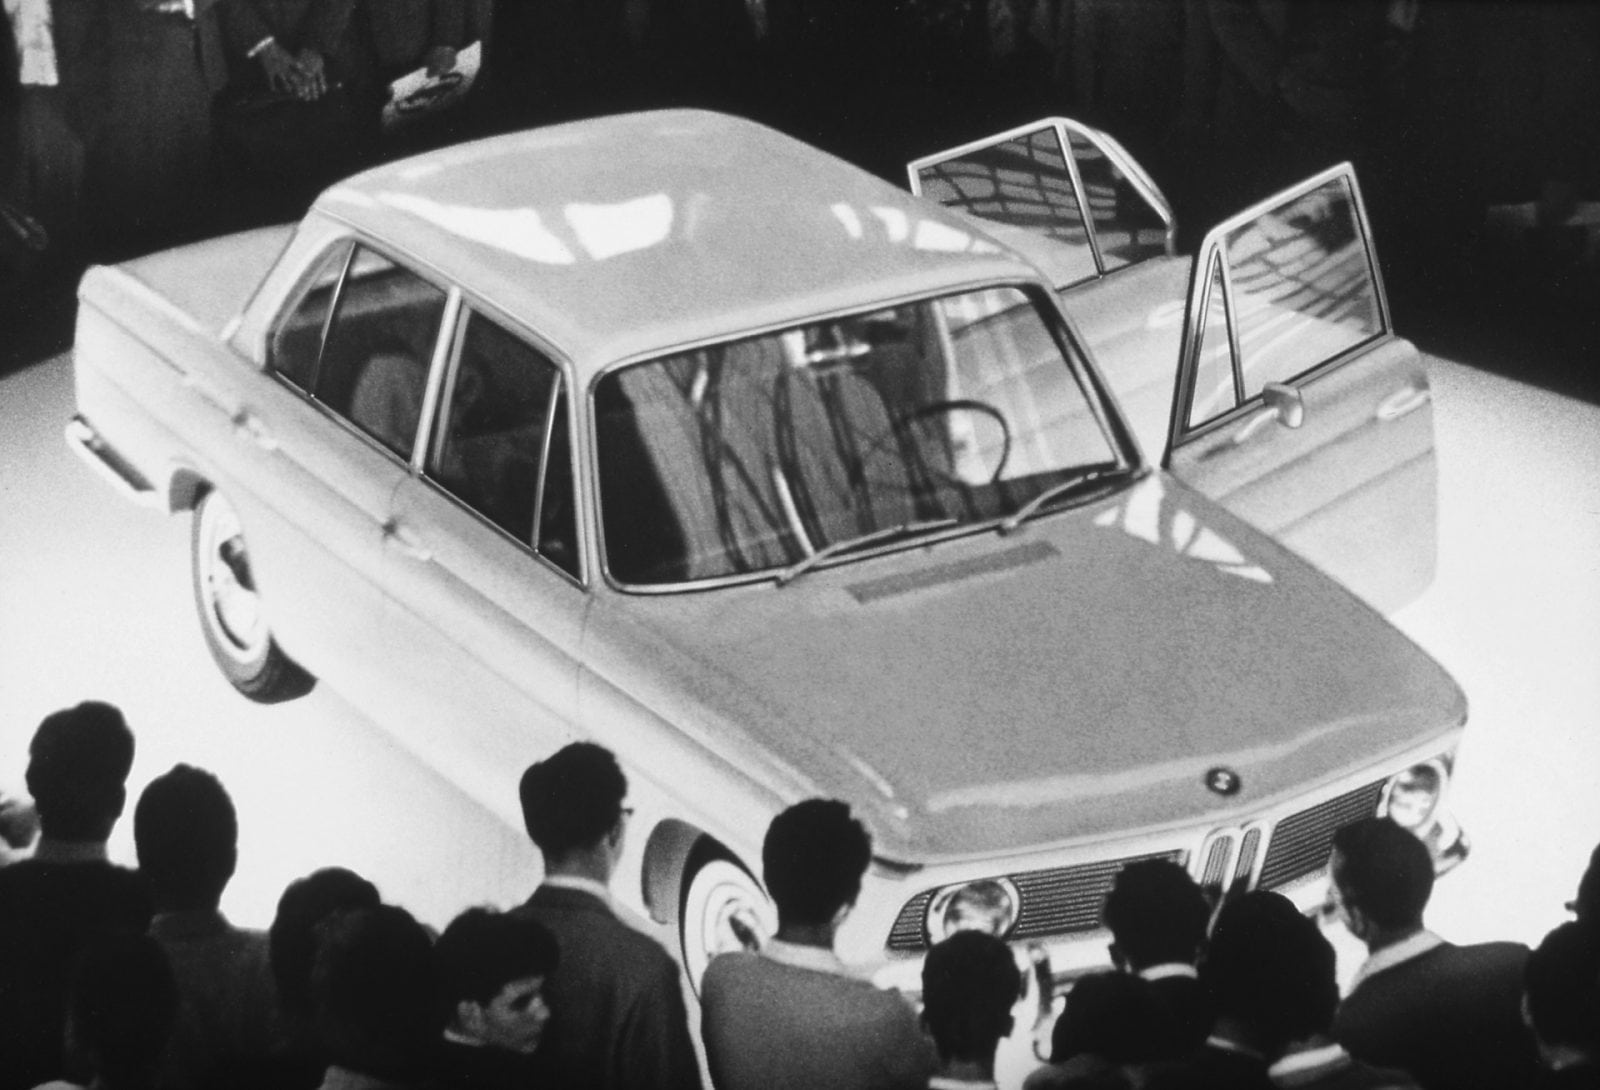 50 Years of BMW New Class, BMW 1500 at 1961 Frankfurt Motor Show (03/2011)